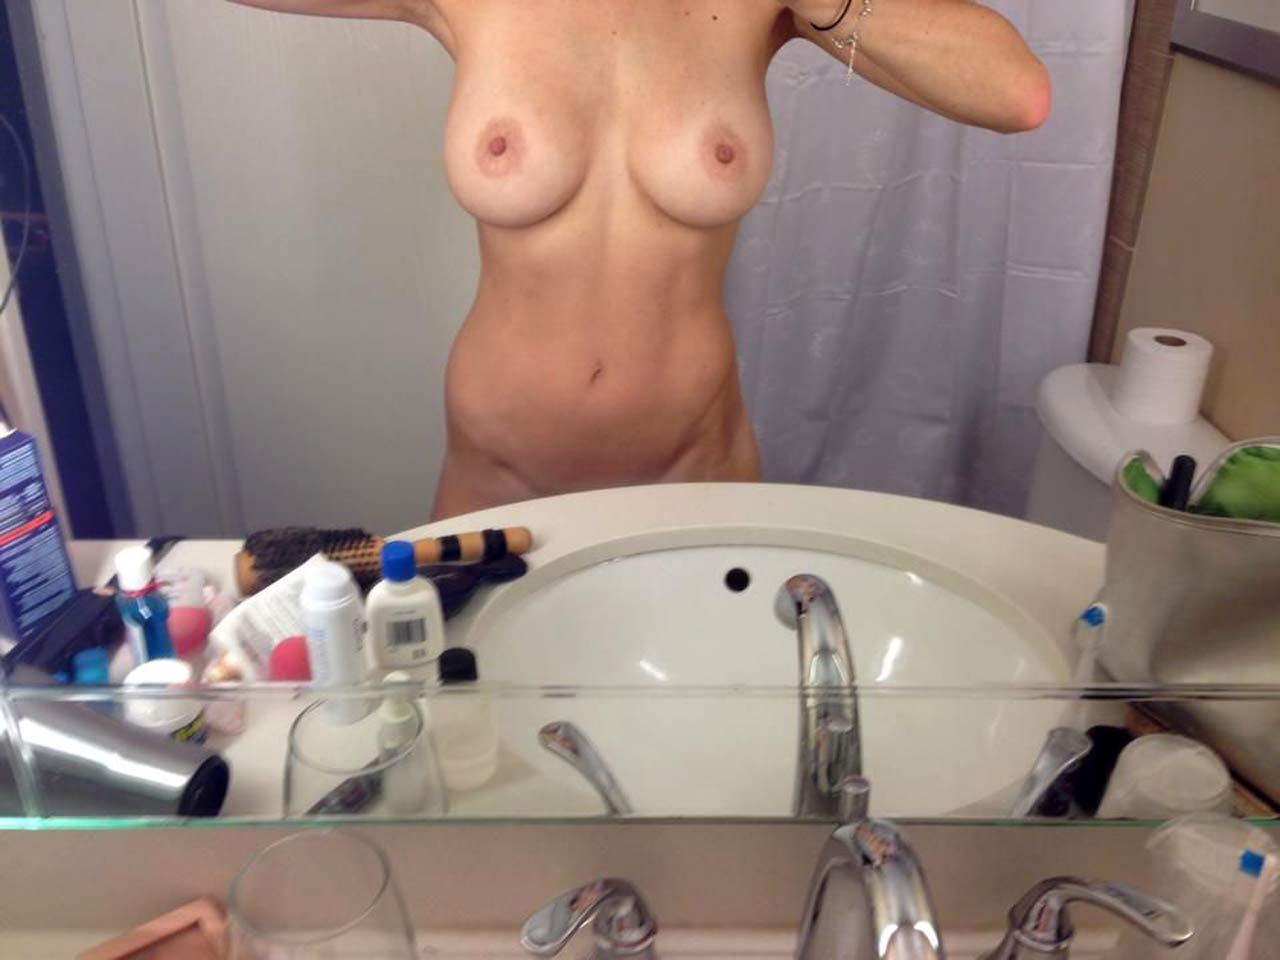 Porn Eefje 'sjokz' Depoortere nudes (59 foto and video), Tits, Leaked, Selfie, butt 2018